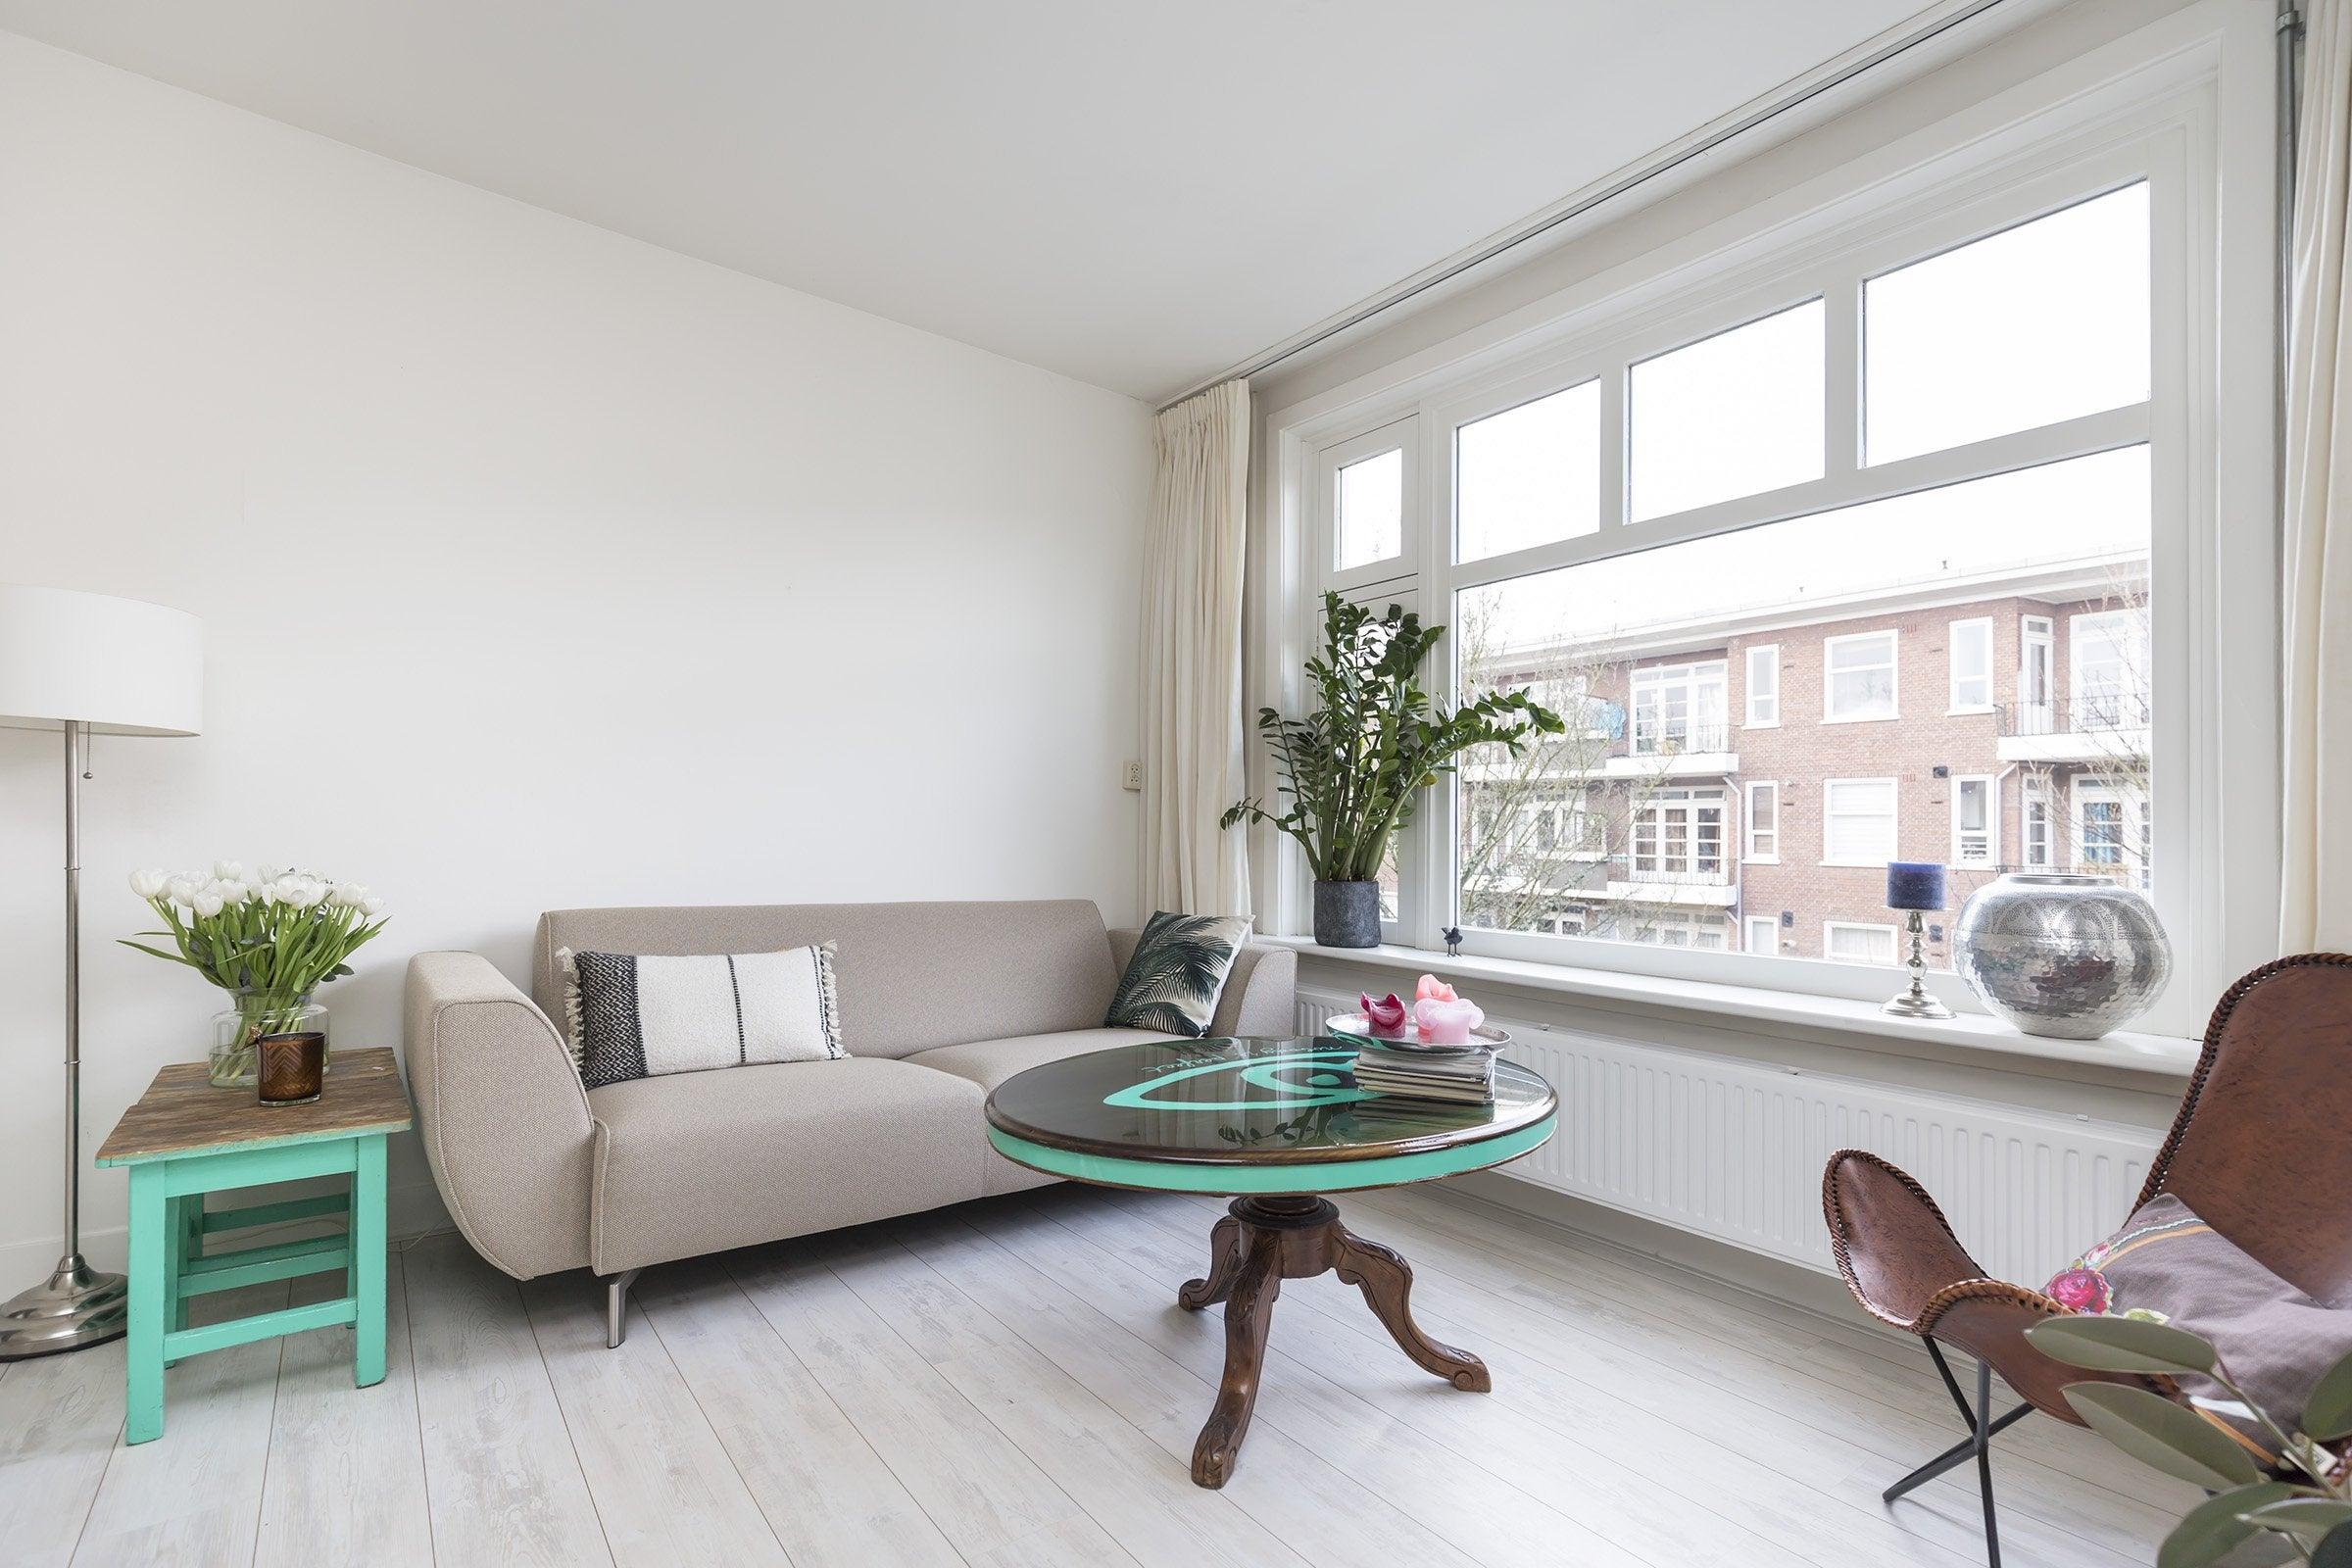 Baetostraat / Amsterdam